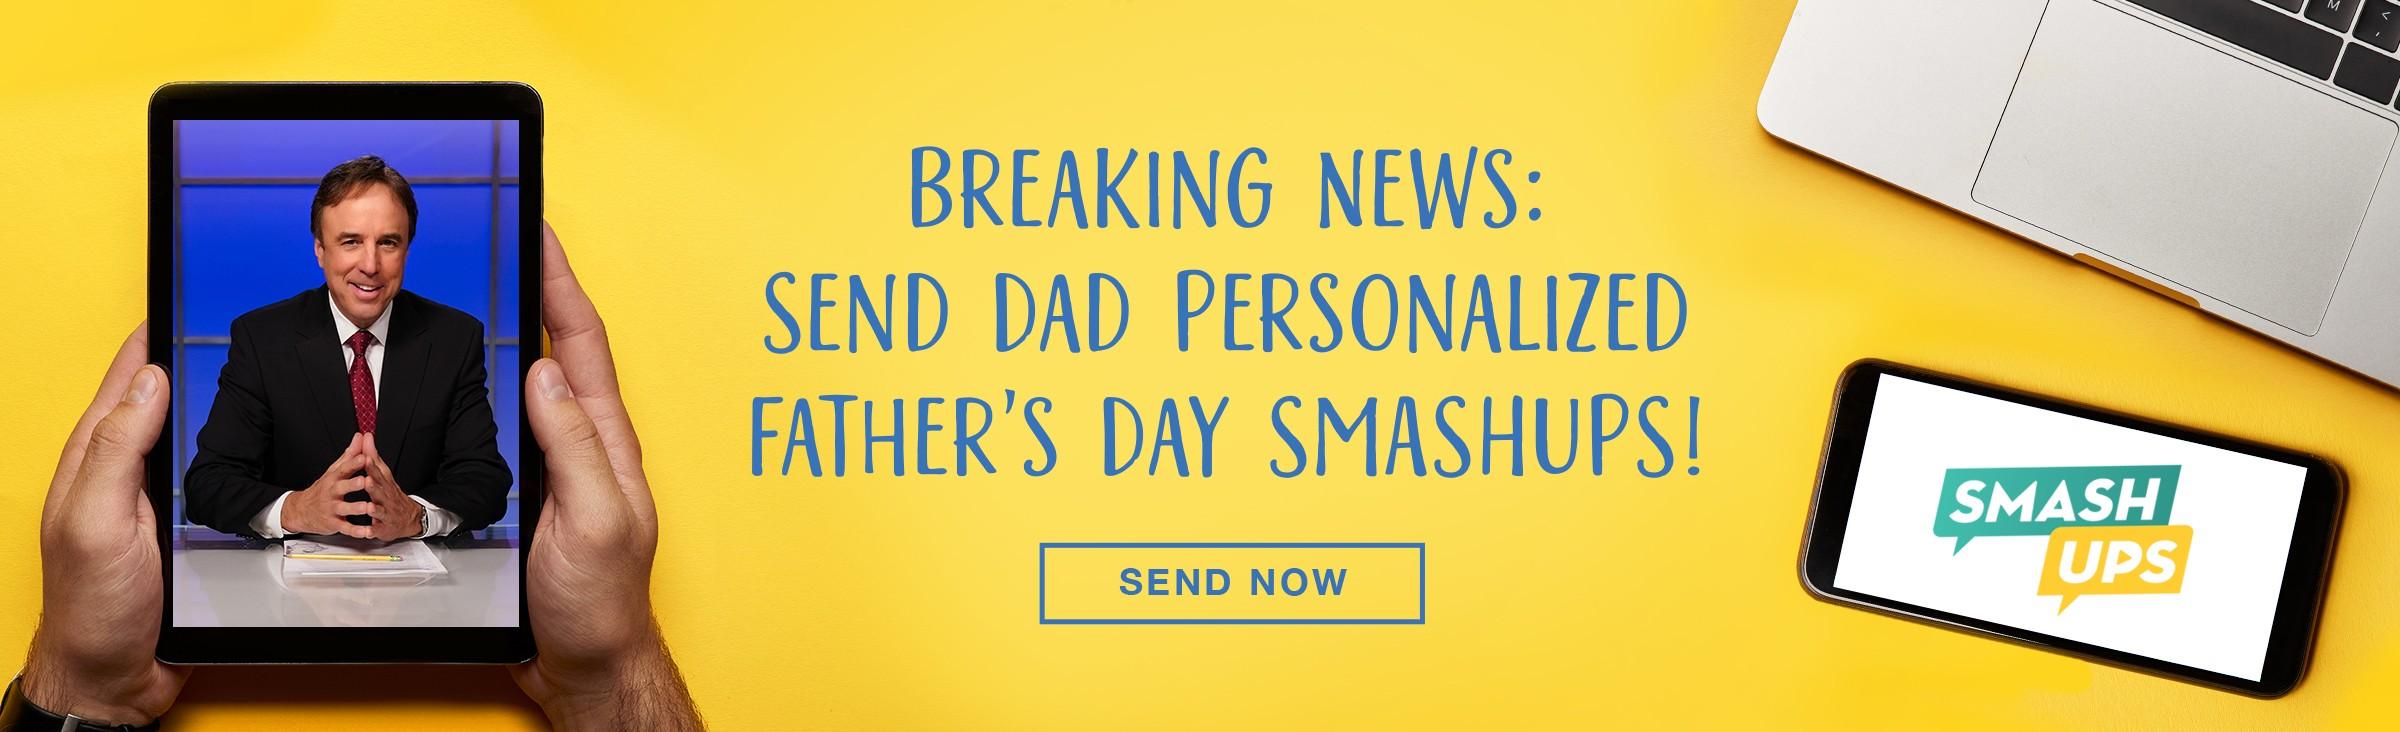 Kevin Nealon Father's Day SmashUps